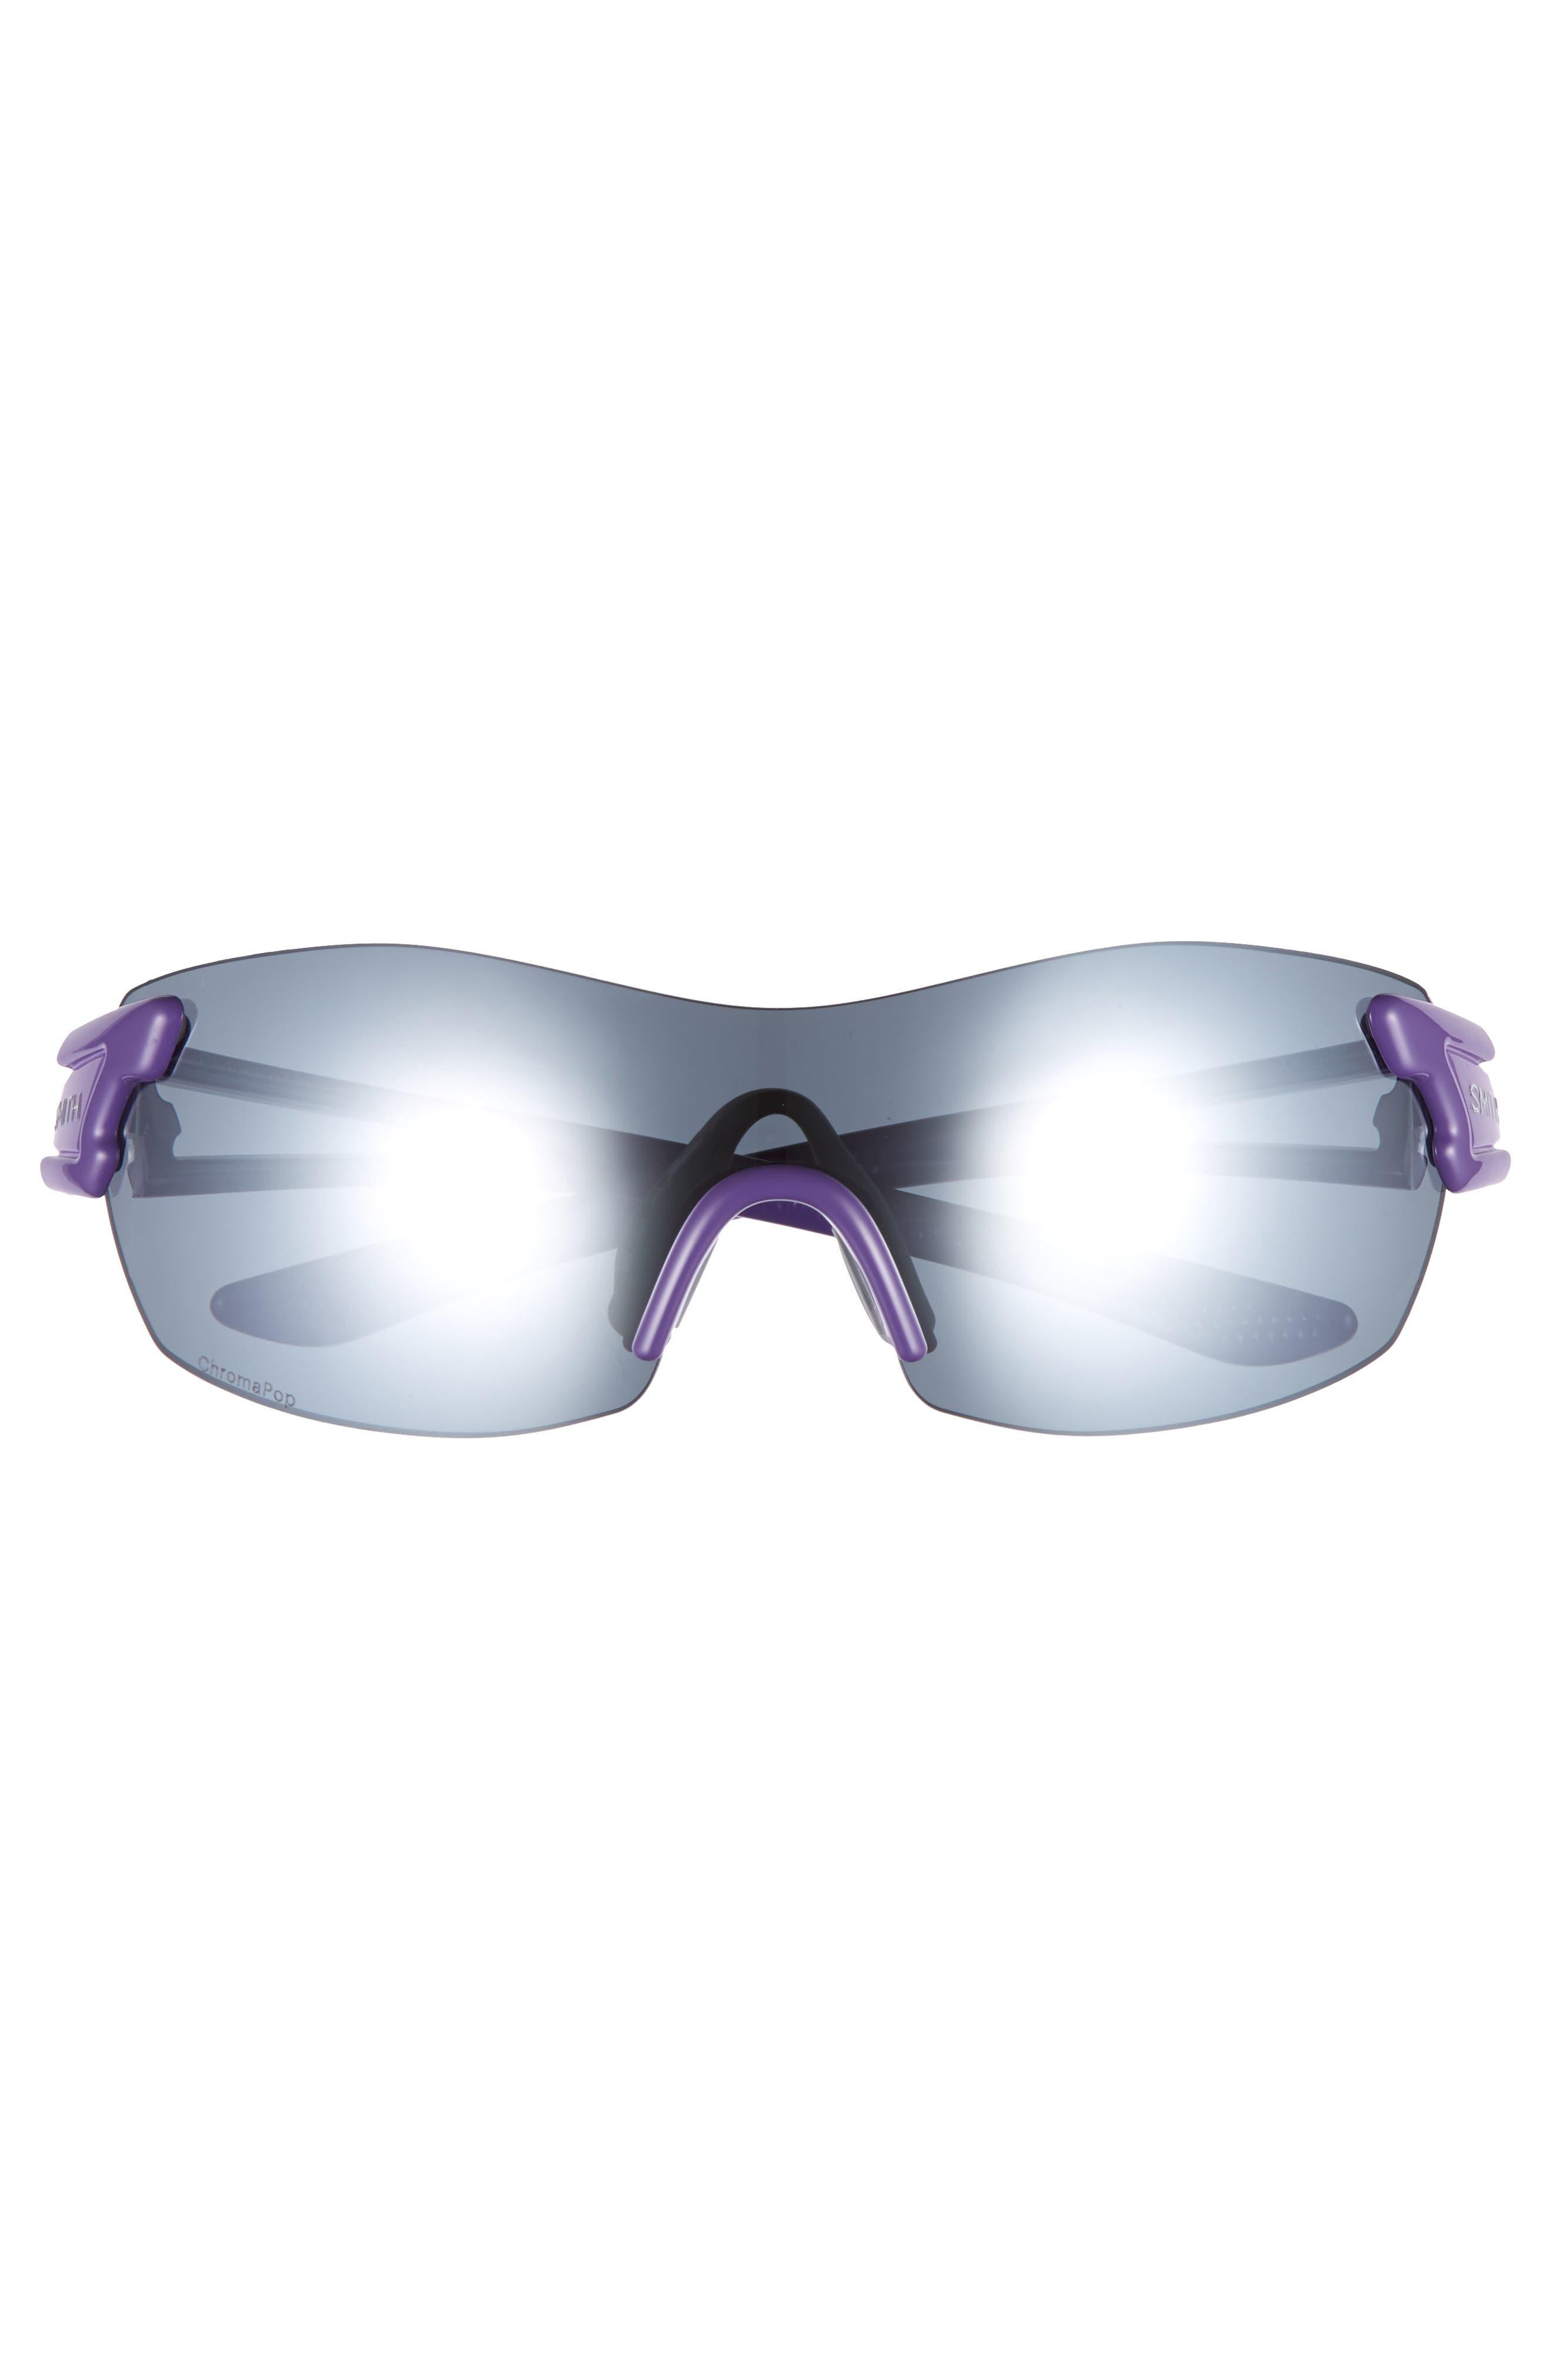 PivLock<sup>™</sup> Asana 150mm ChromaPop Polarized Sunglasses,                             Alternate thumbnail 3, color,                             Violet